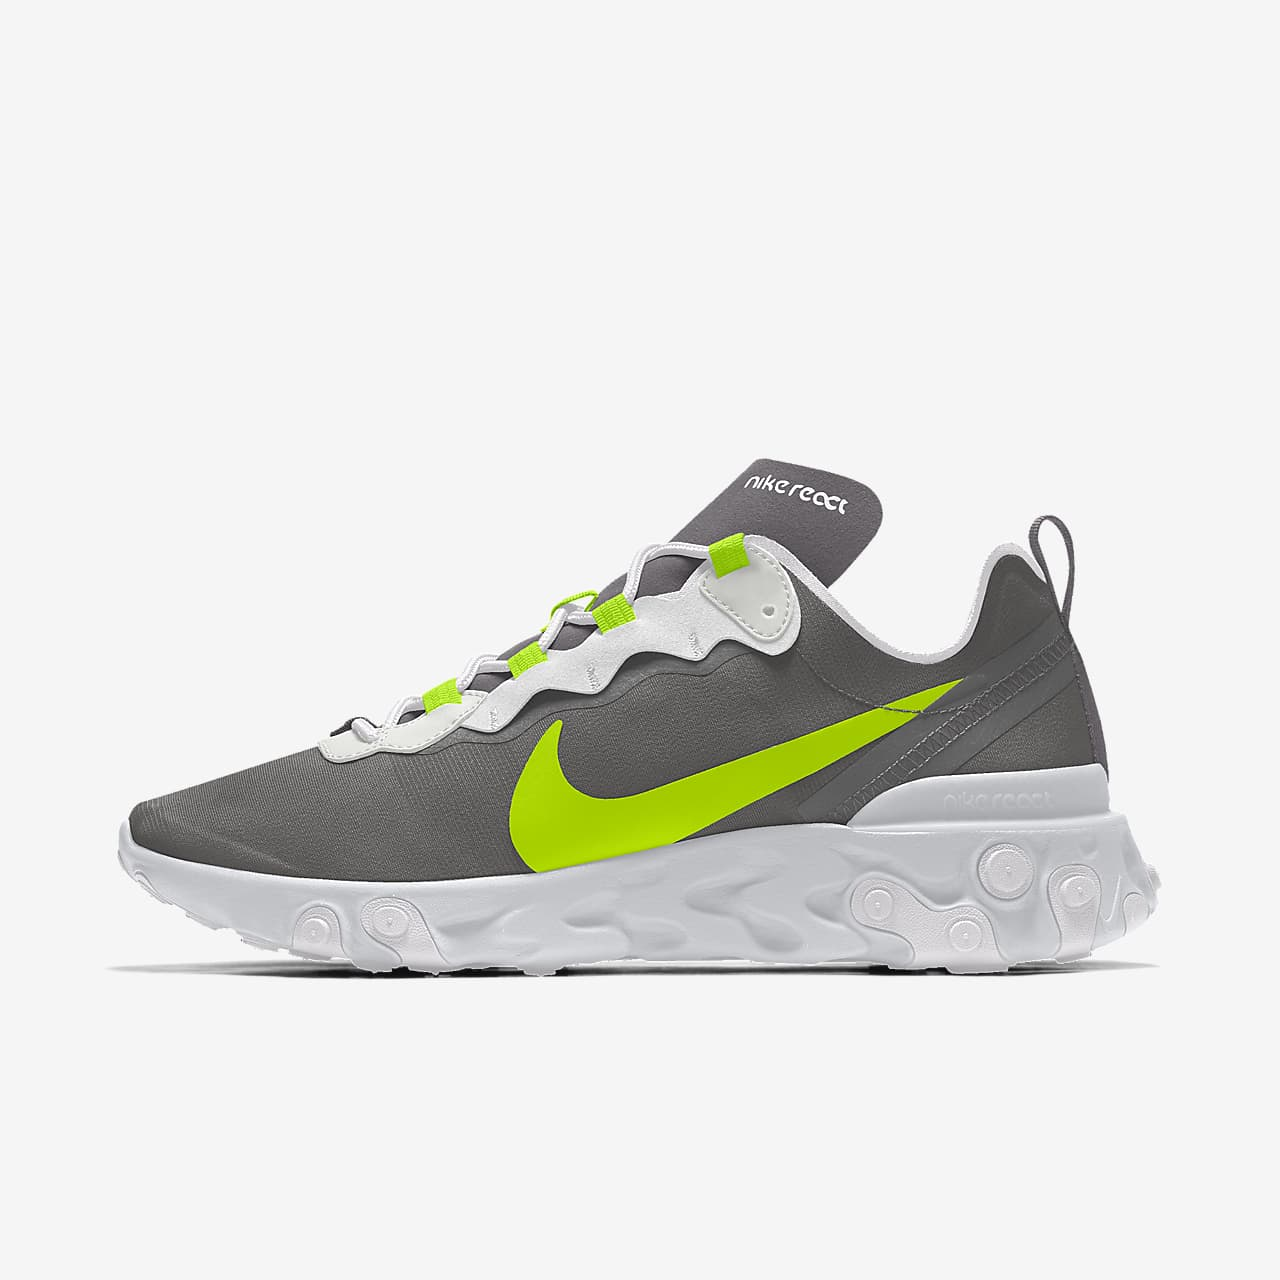 Nike React Element 55 By You personalisierbarer Herren-Freizeitschuh